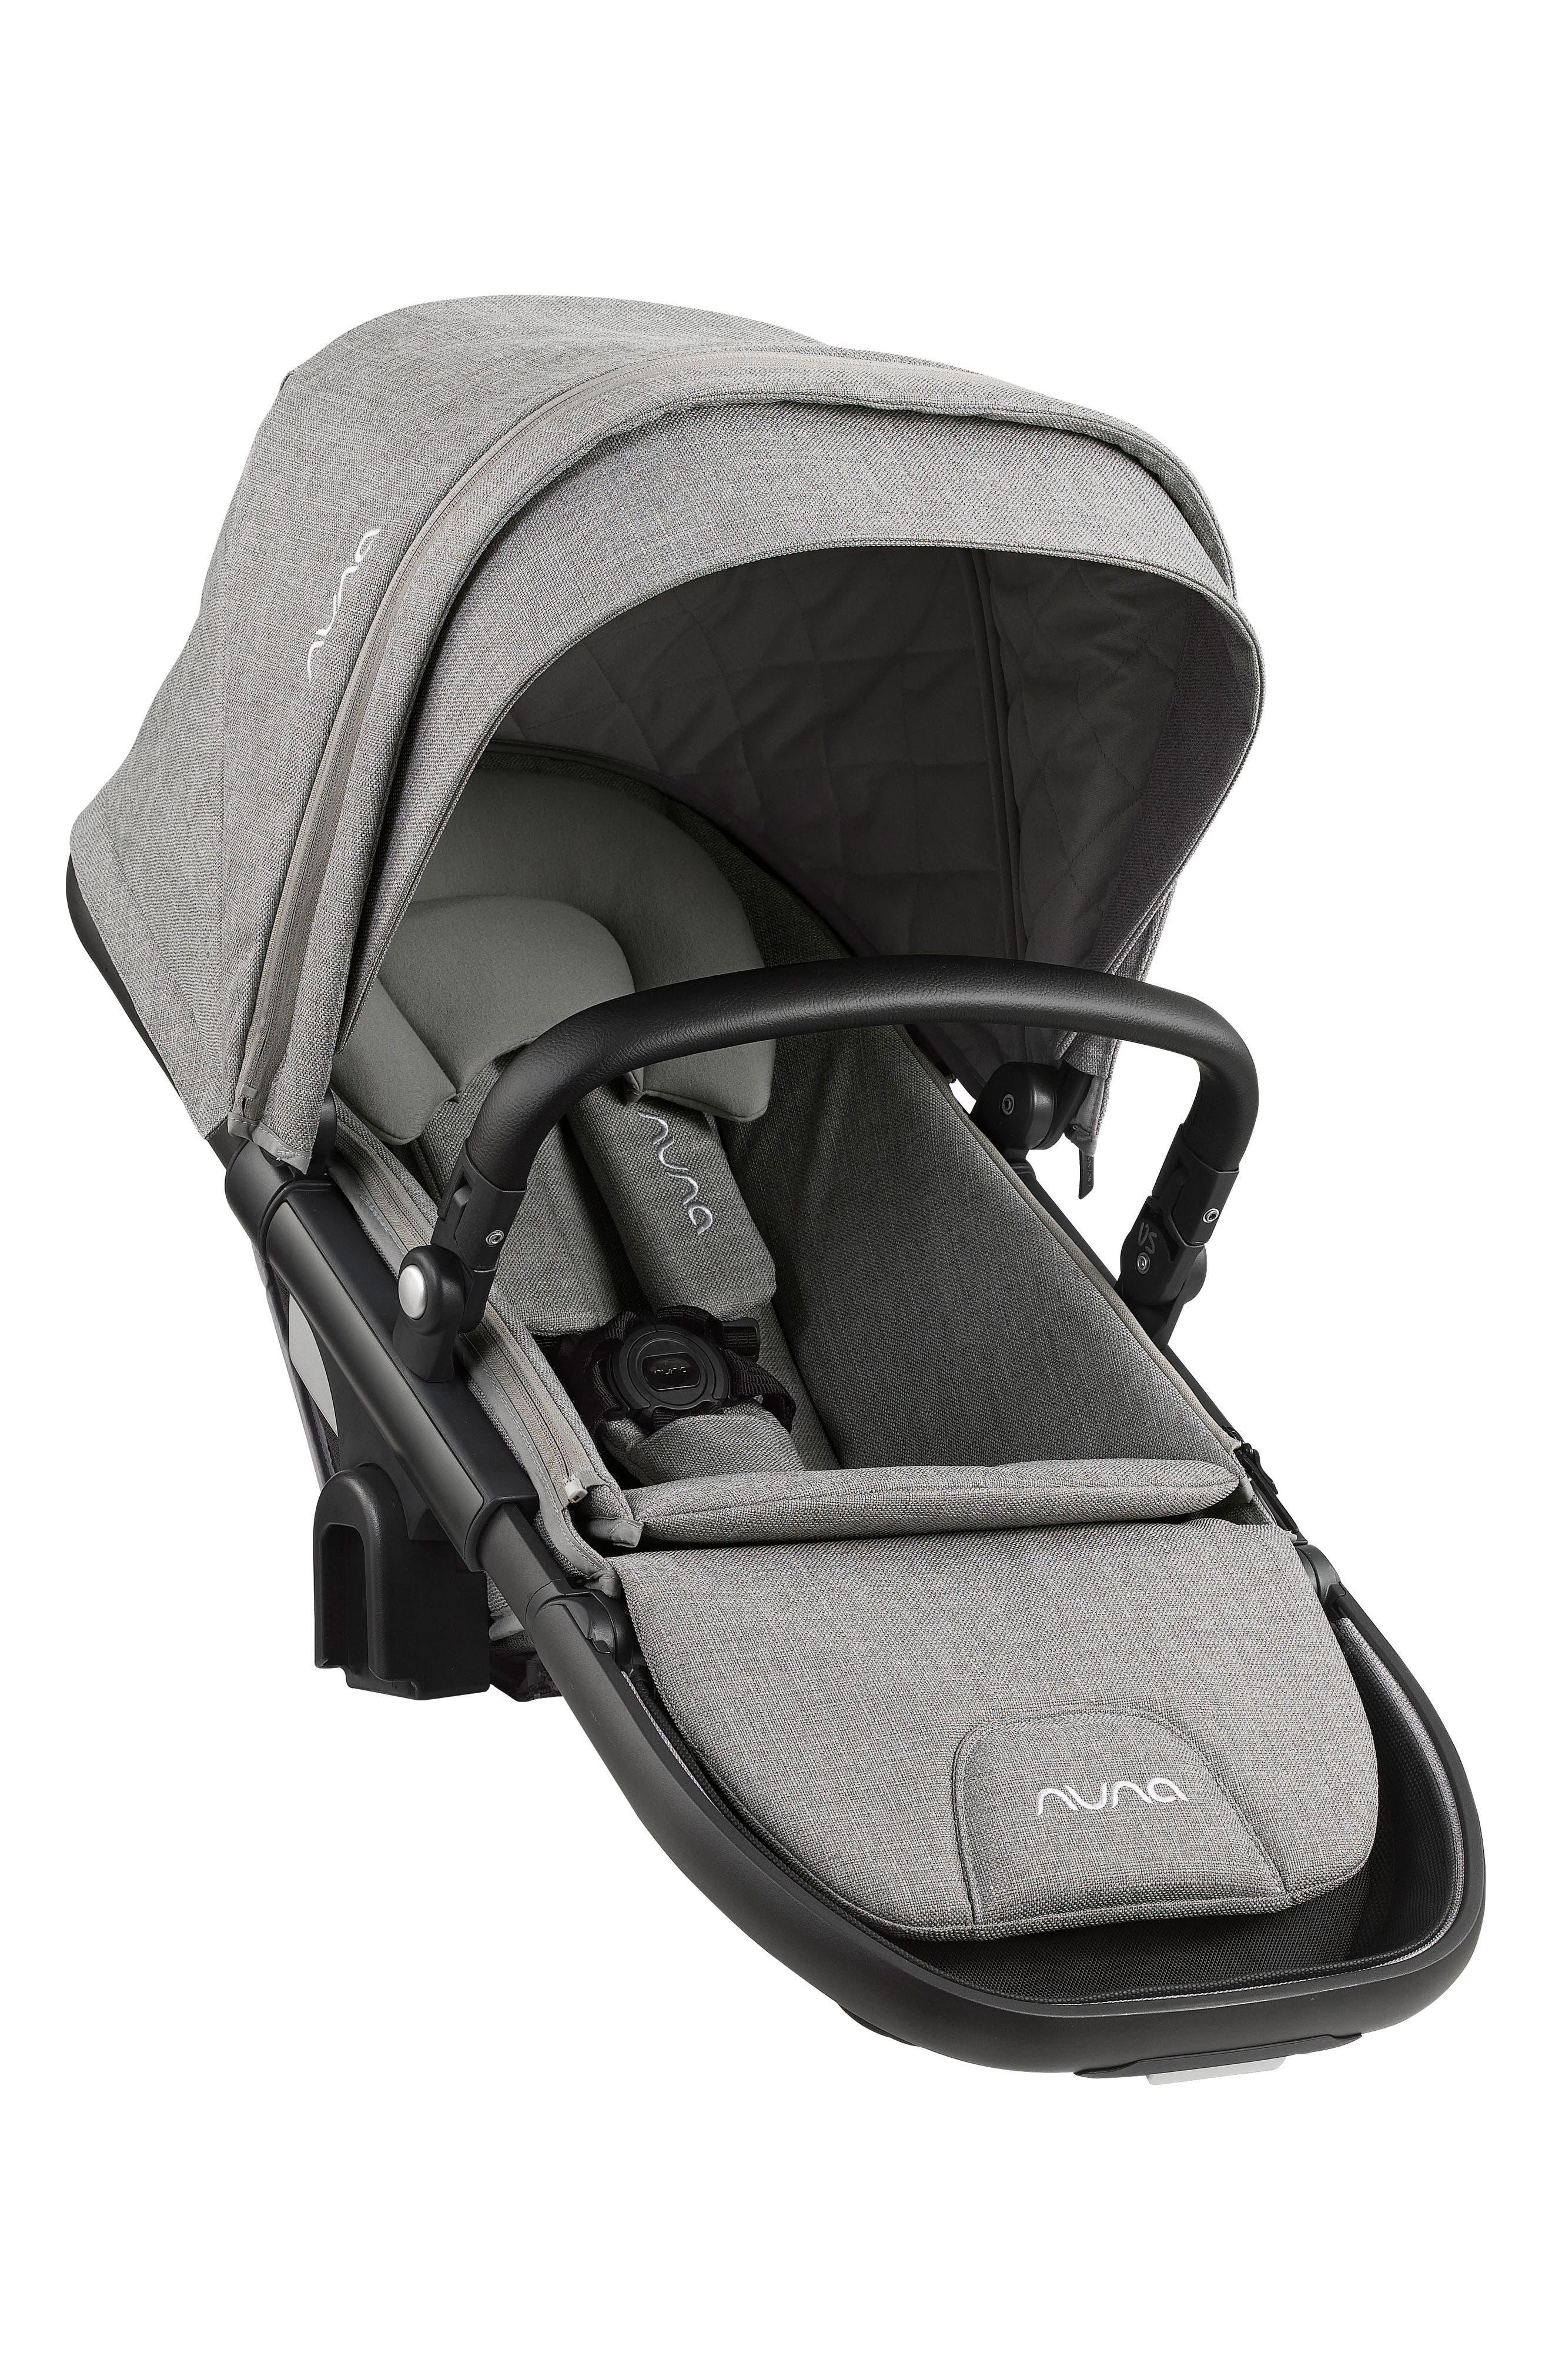 nuna DEMI™ Grow Sibling Seat Attachment for DEMI Grow Stroller